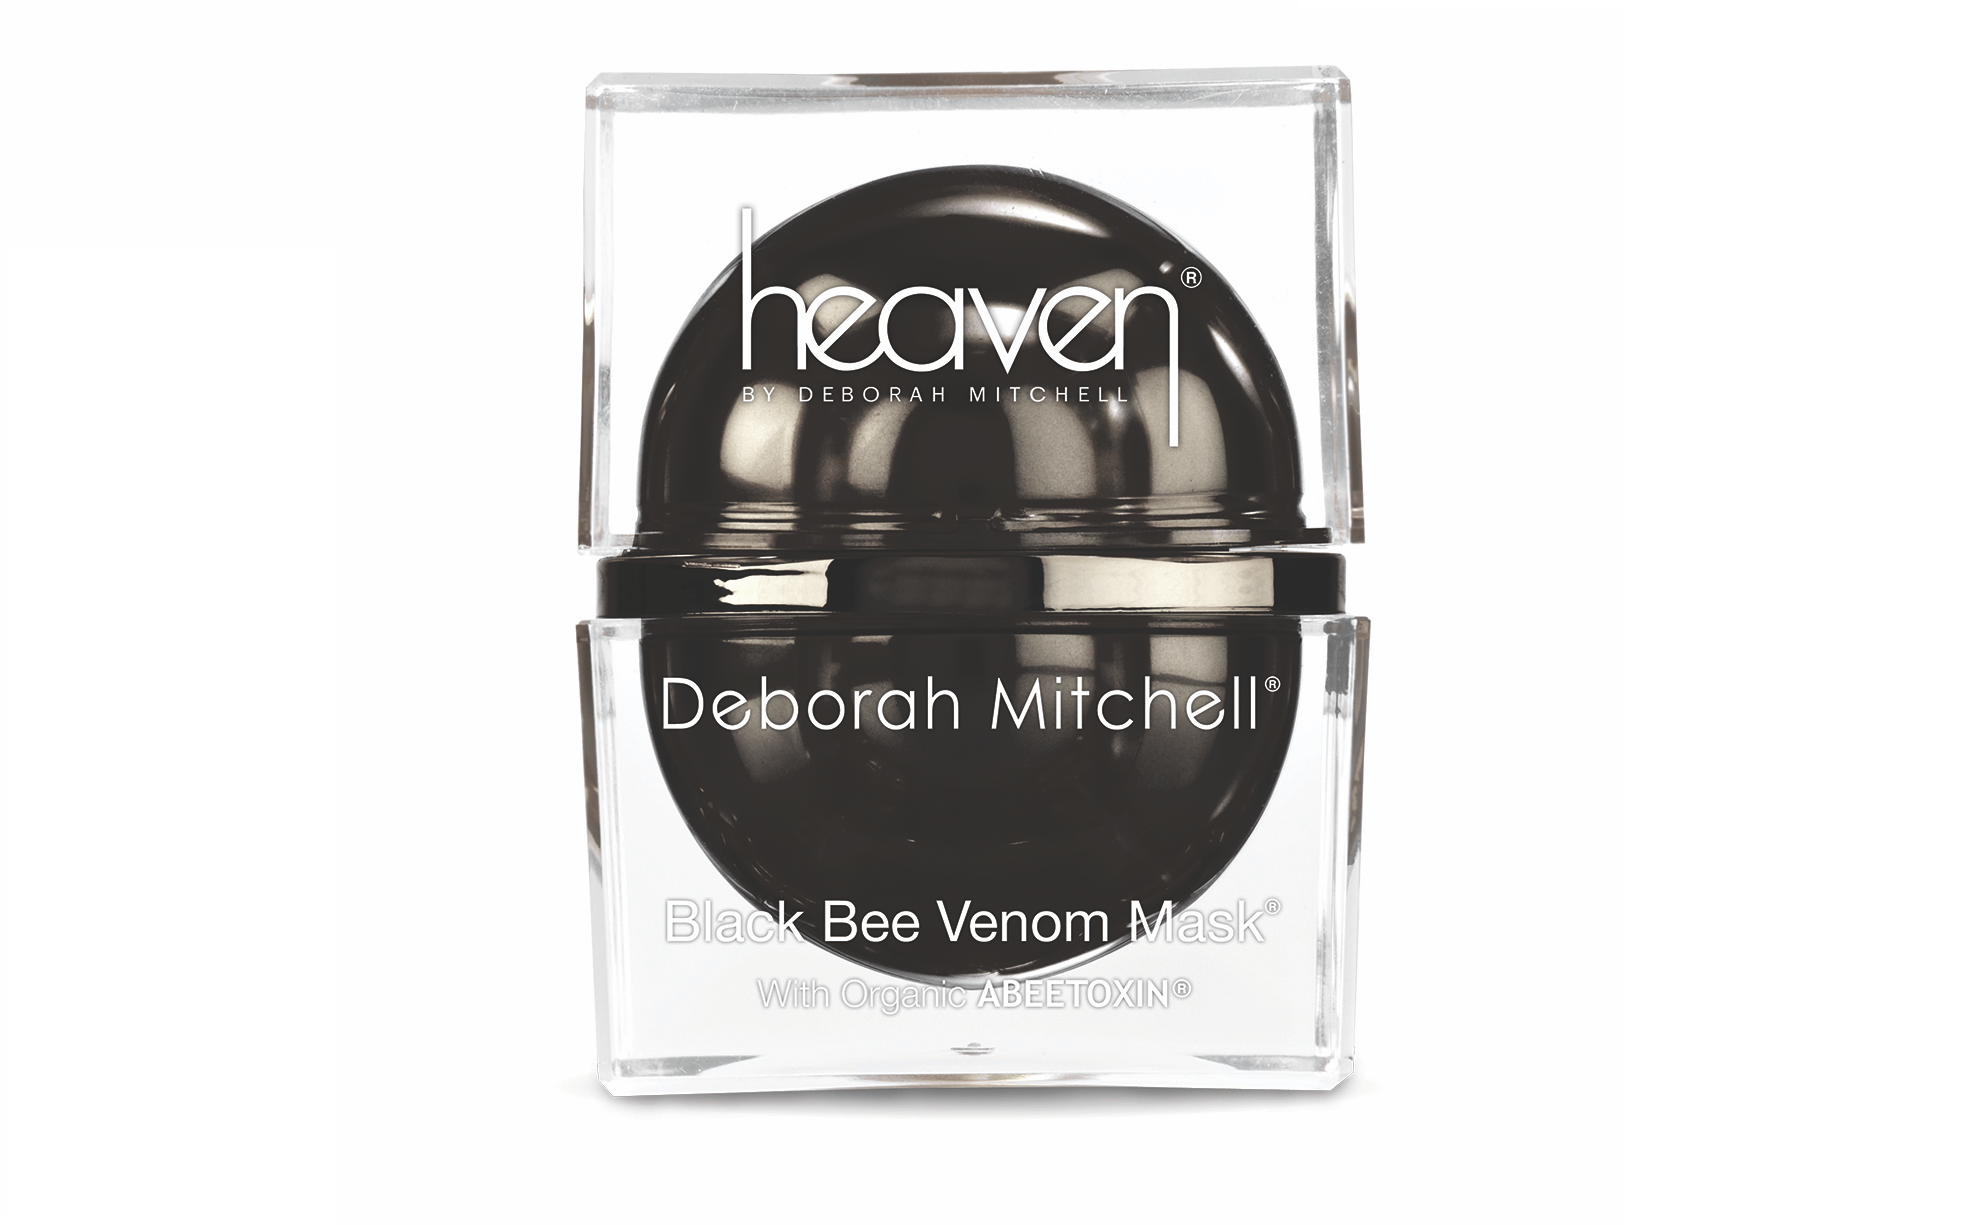 Heaven skincare black bee venom mask